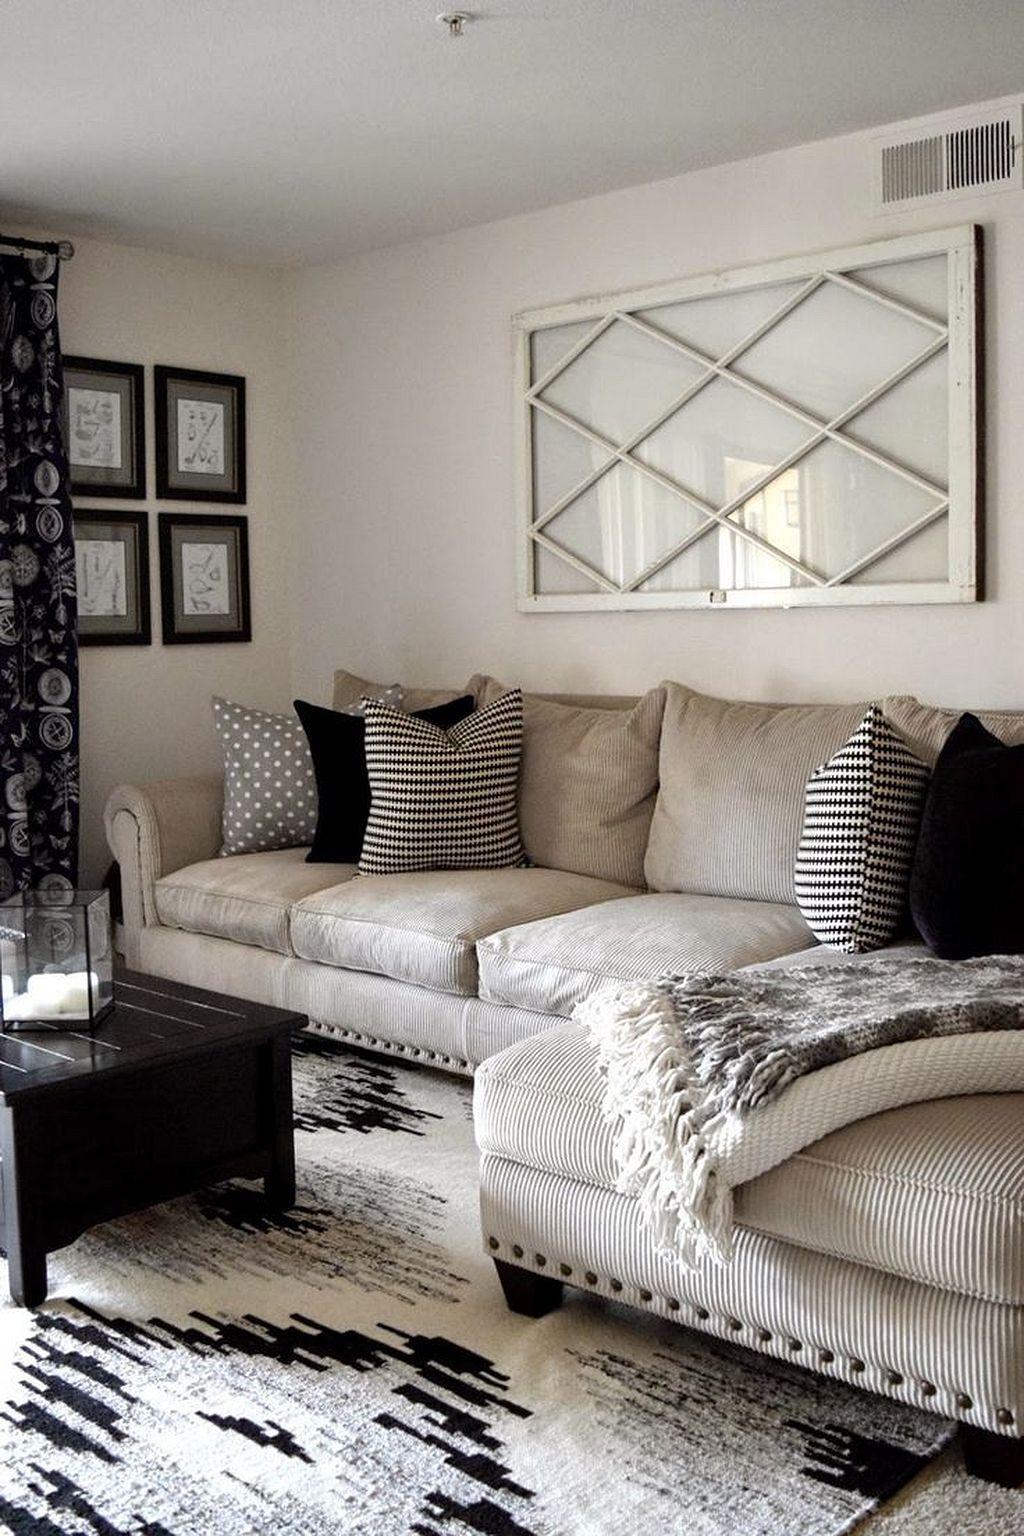 Best Living Room Designs: 50+ Best Apartement Living Room Decorating Ideas